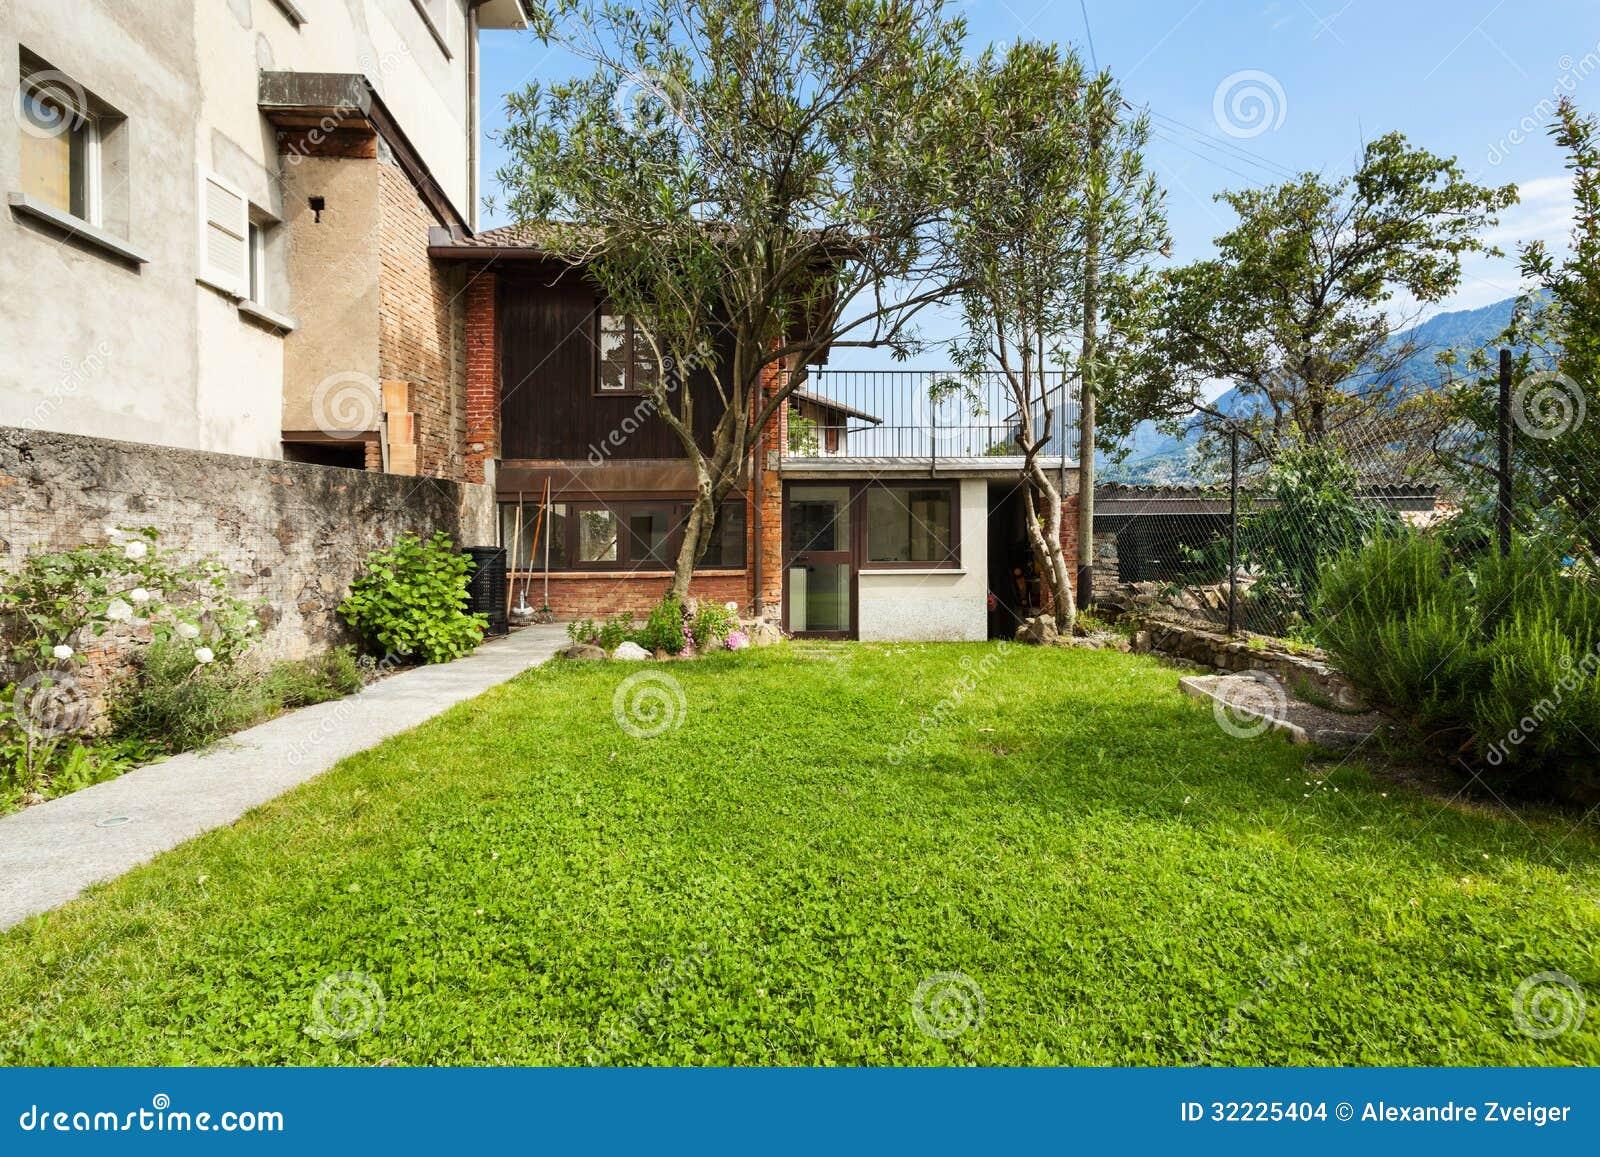 dcb2f0e62352 Μικρό εξοχικό σπίτι